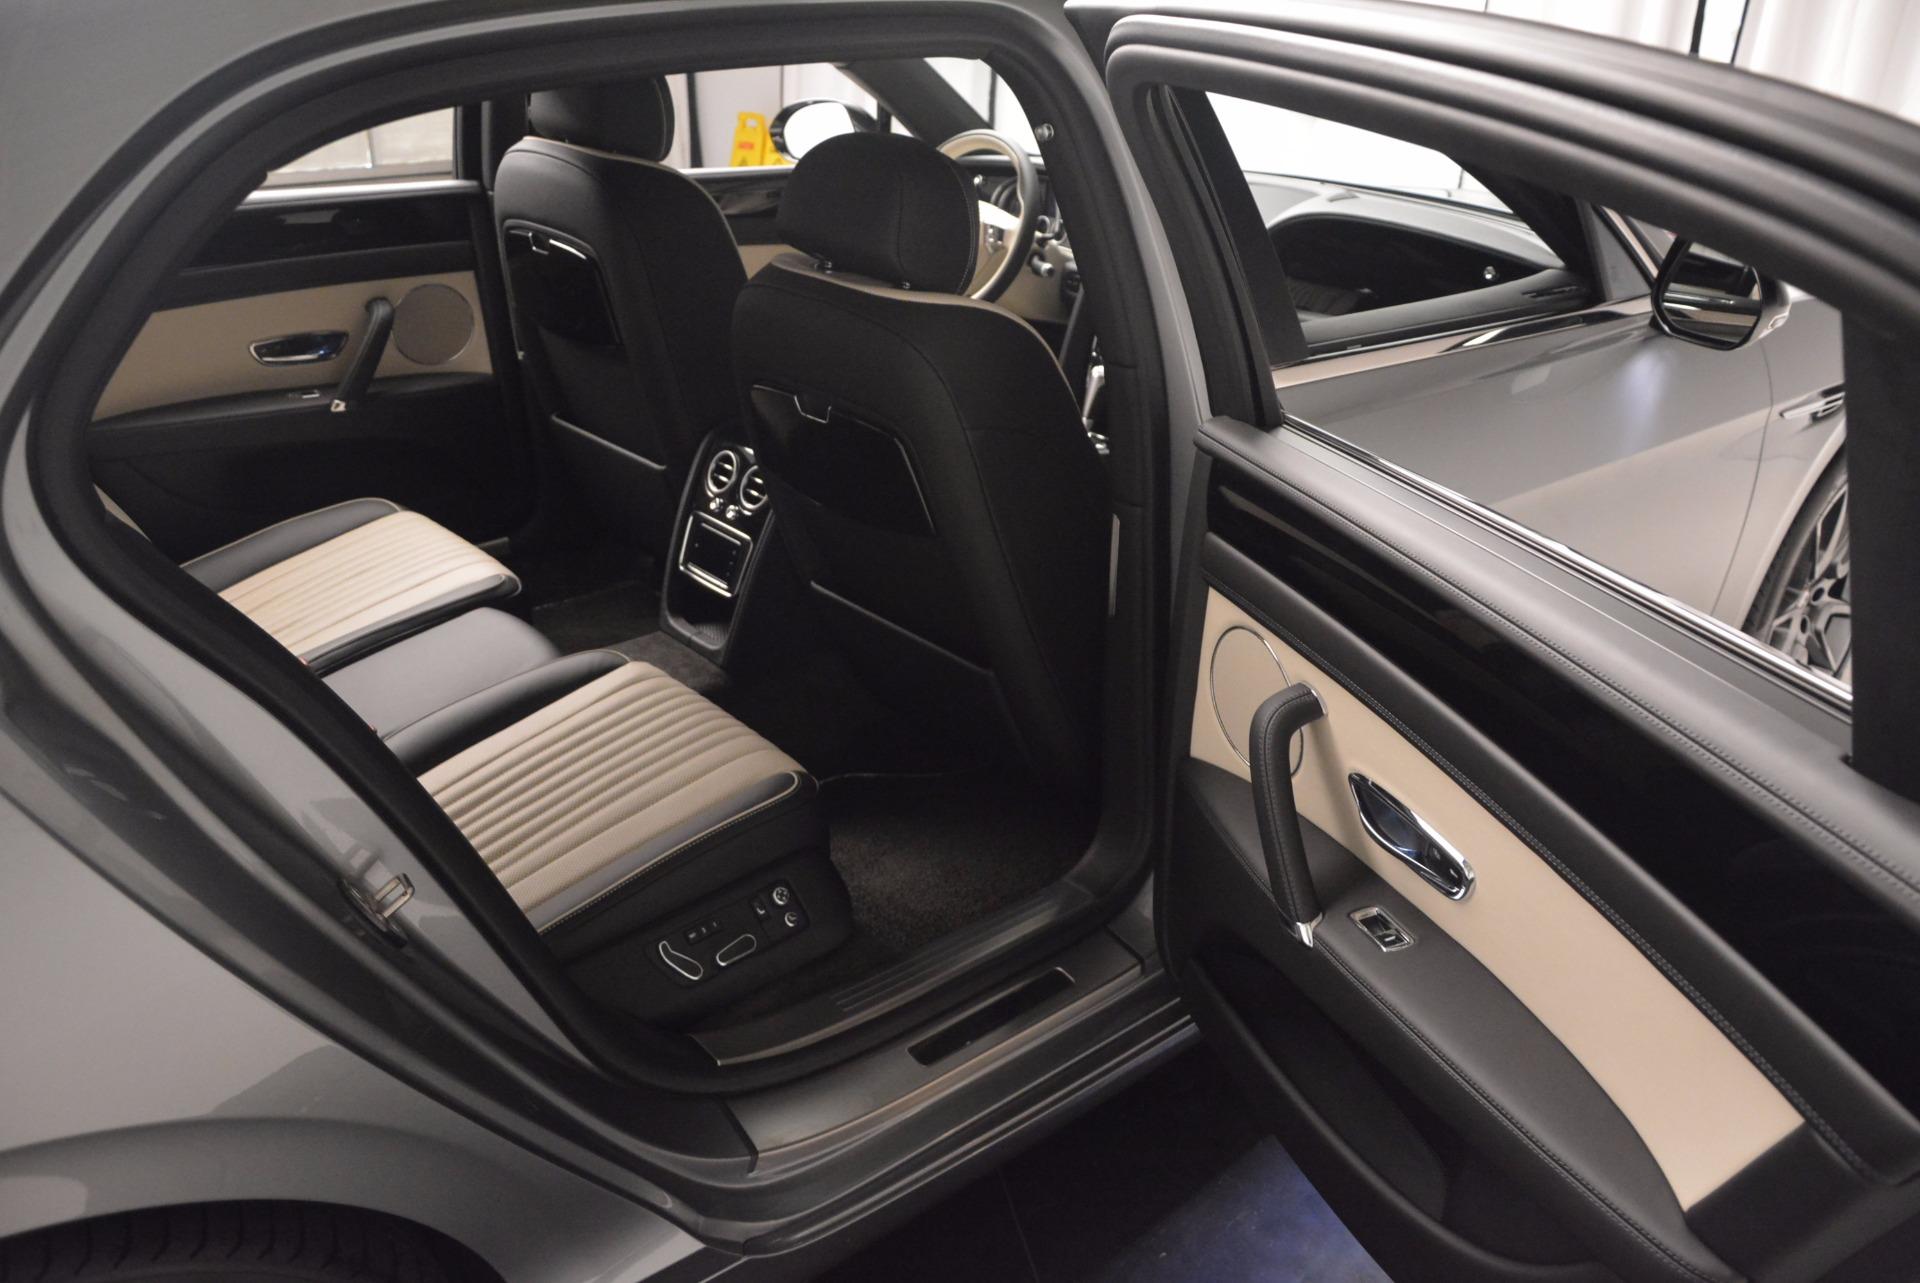 New 2017 Bentley Flying Spur V8 S  For Sale In Westport, CT 651_p29